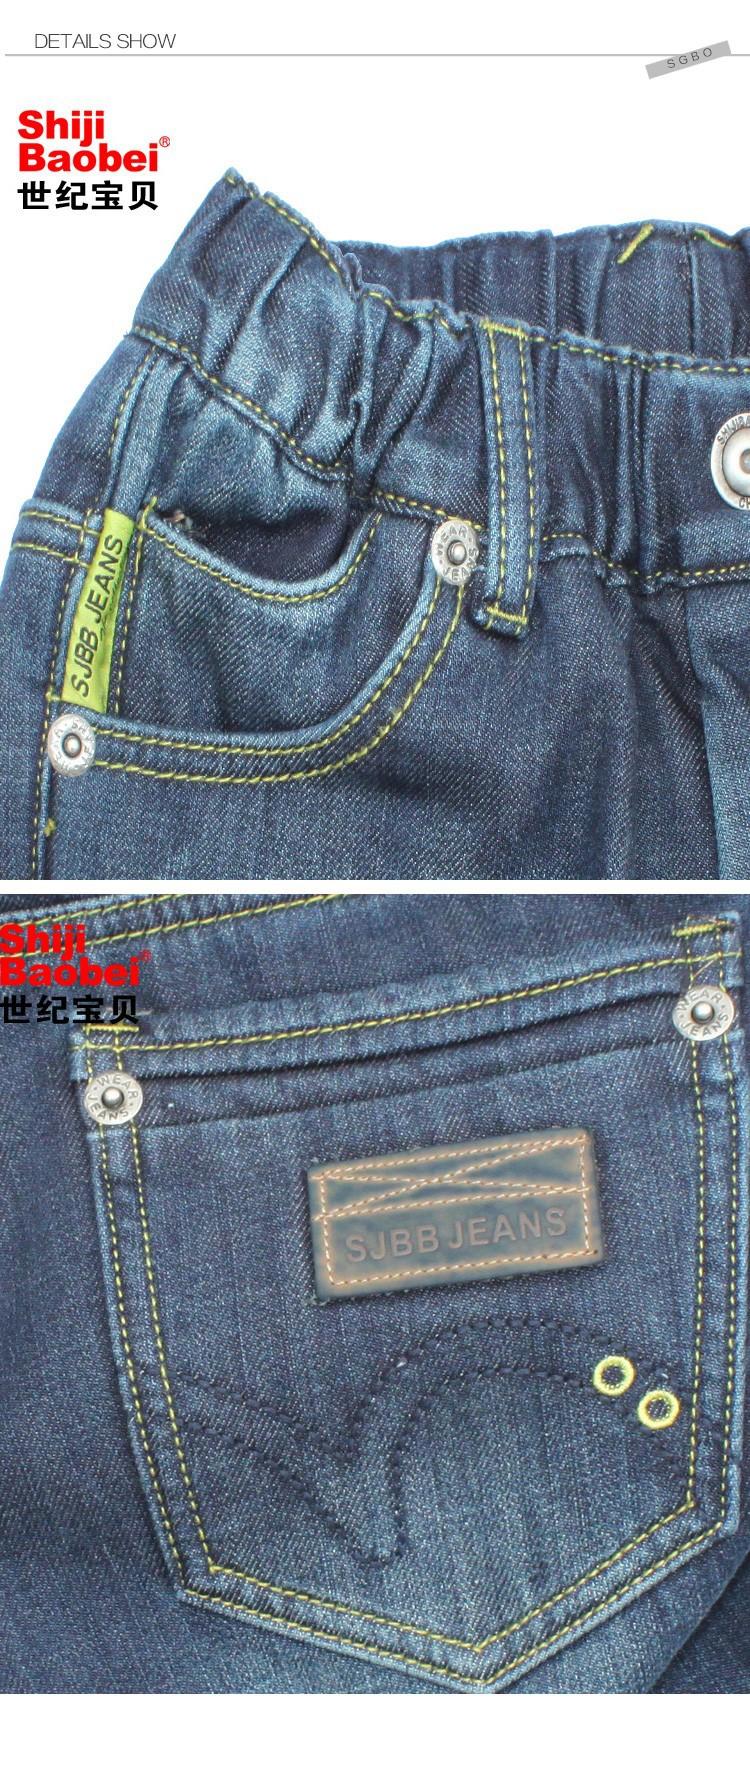 2015 New Fashion Big Boys Jeans Kids High Quality Brand Denim Trousers Children Casual Cowboy Pants Big Size 6 8 10 12 14 16 Y